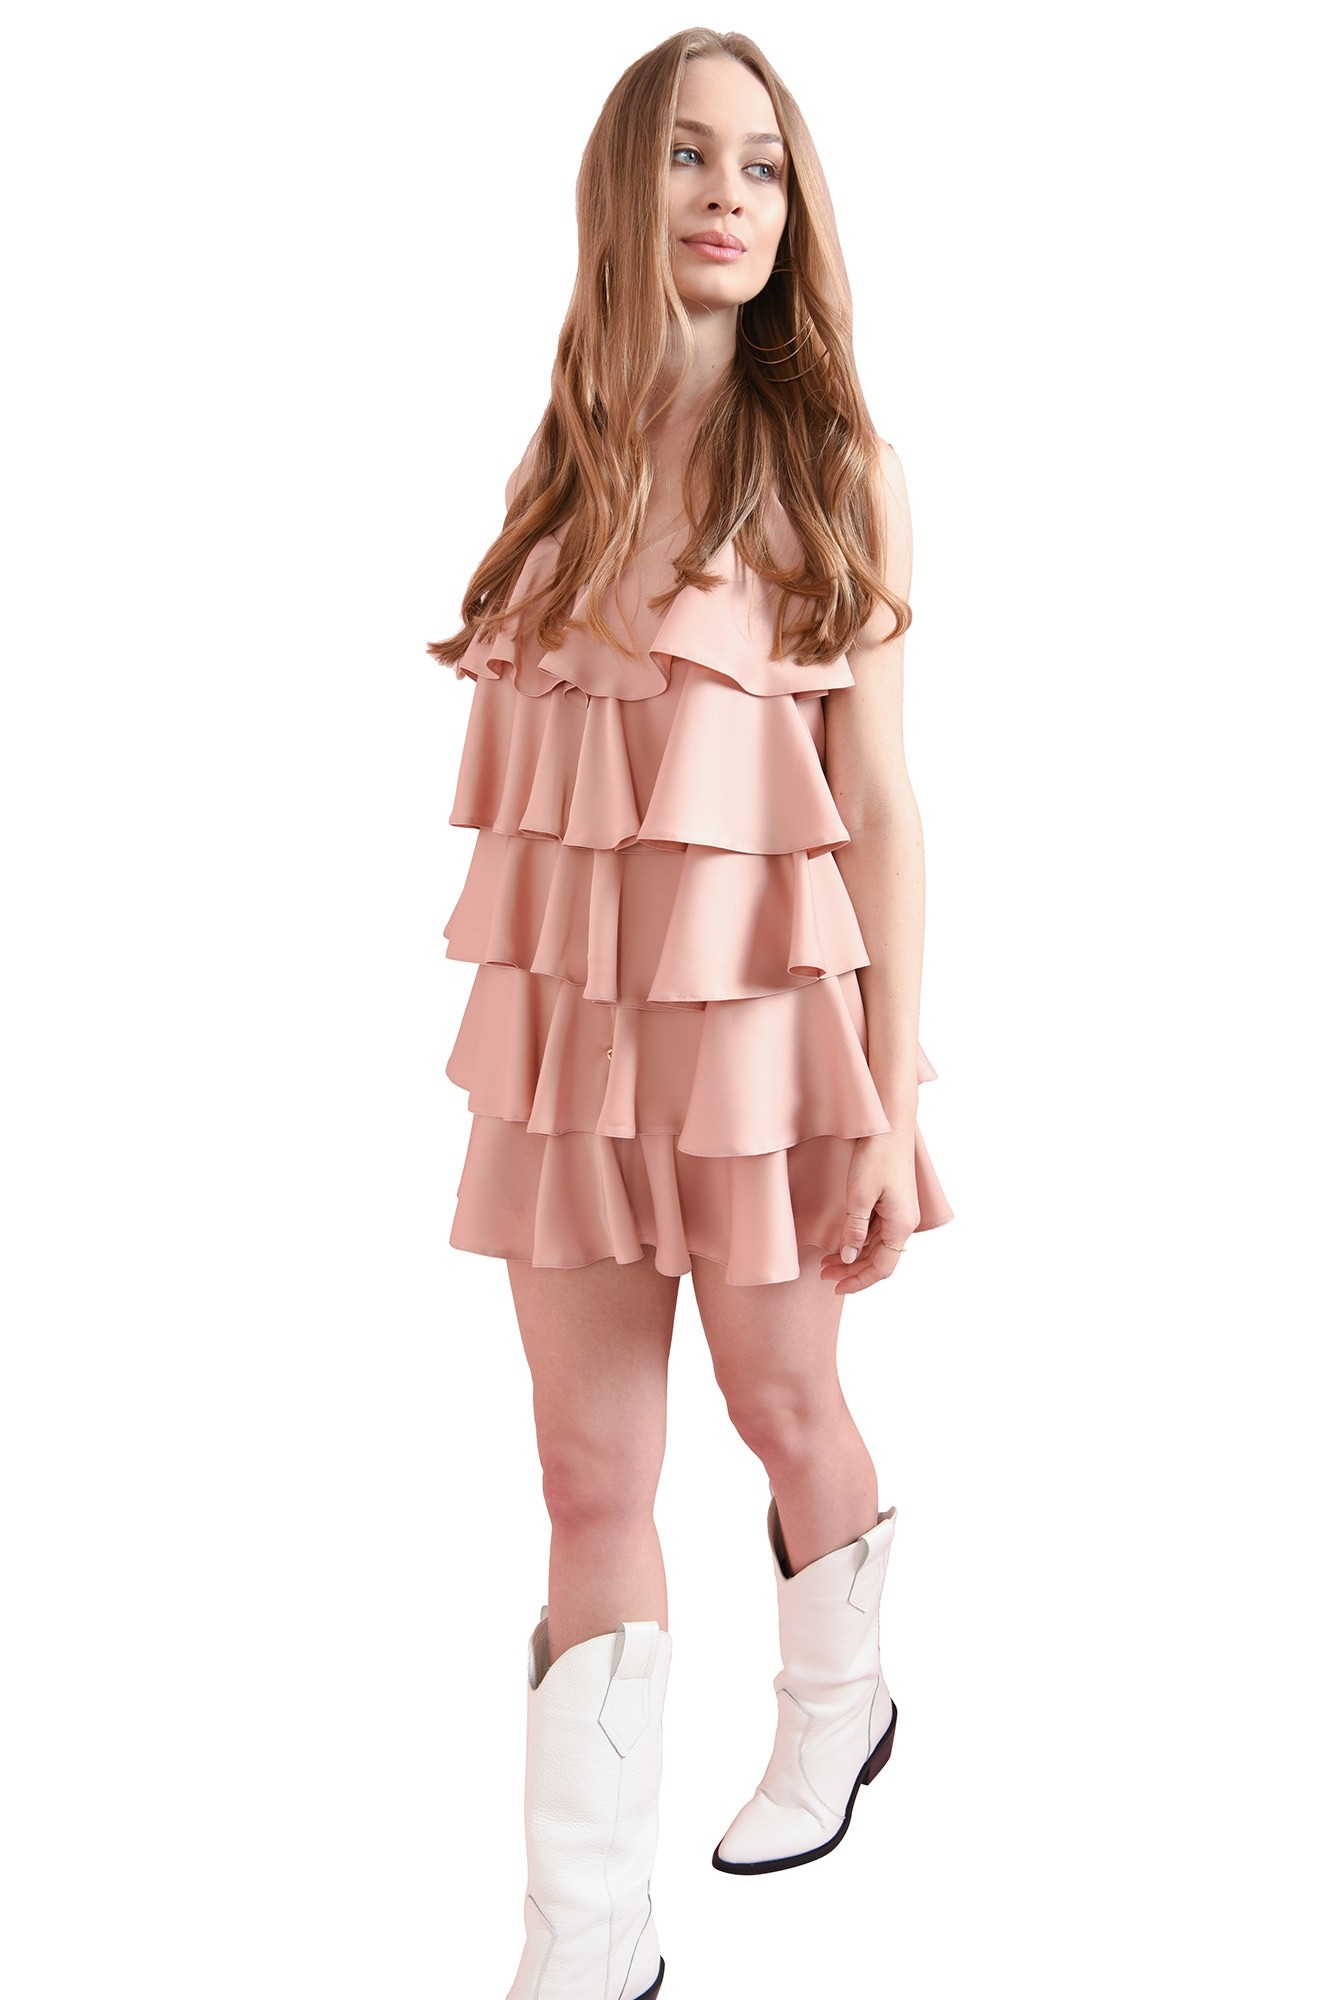 3 - rochie roz pastel, cu volane suprapuse